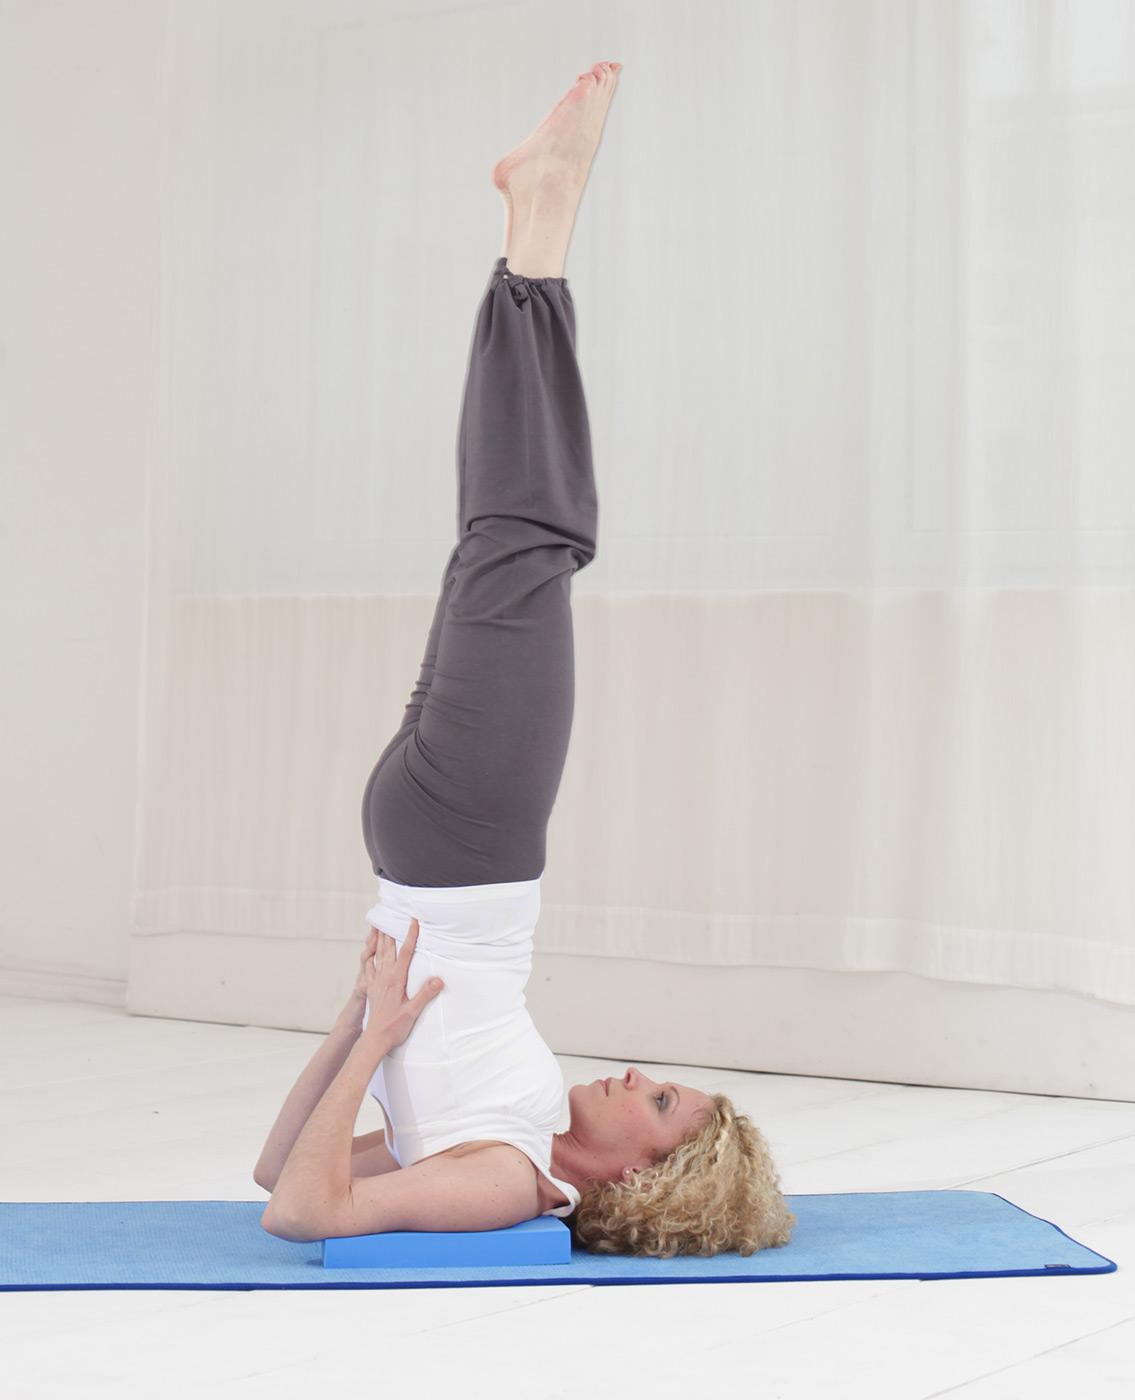 Buy Yoga Blocks London: Yoga Block 'Shoulderstand' Buy Online At YOGISTAR.COM